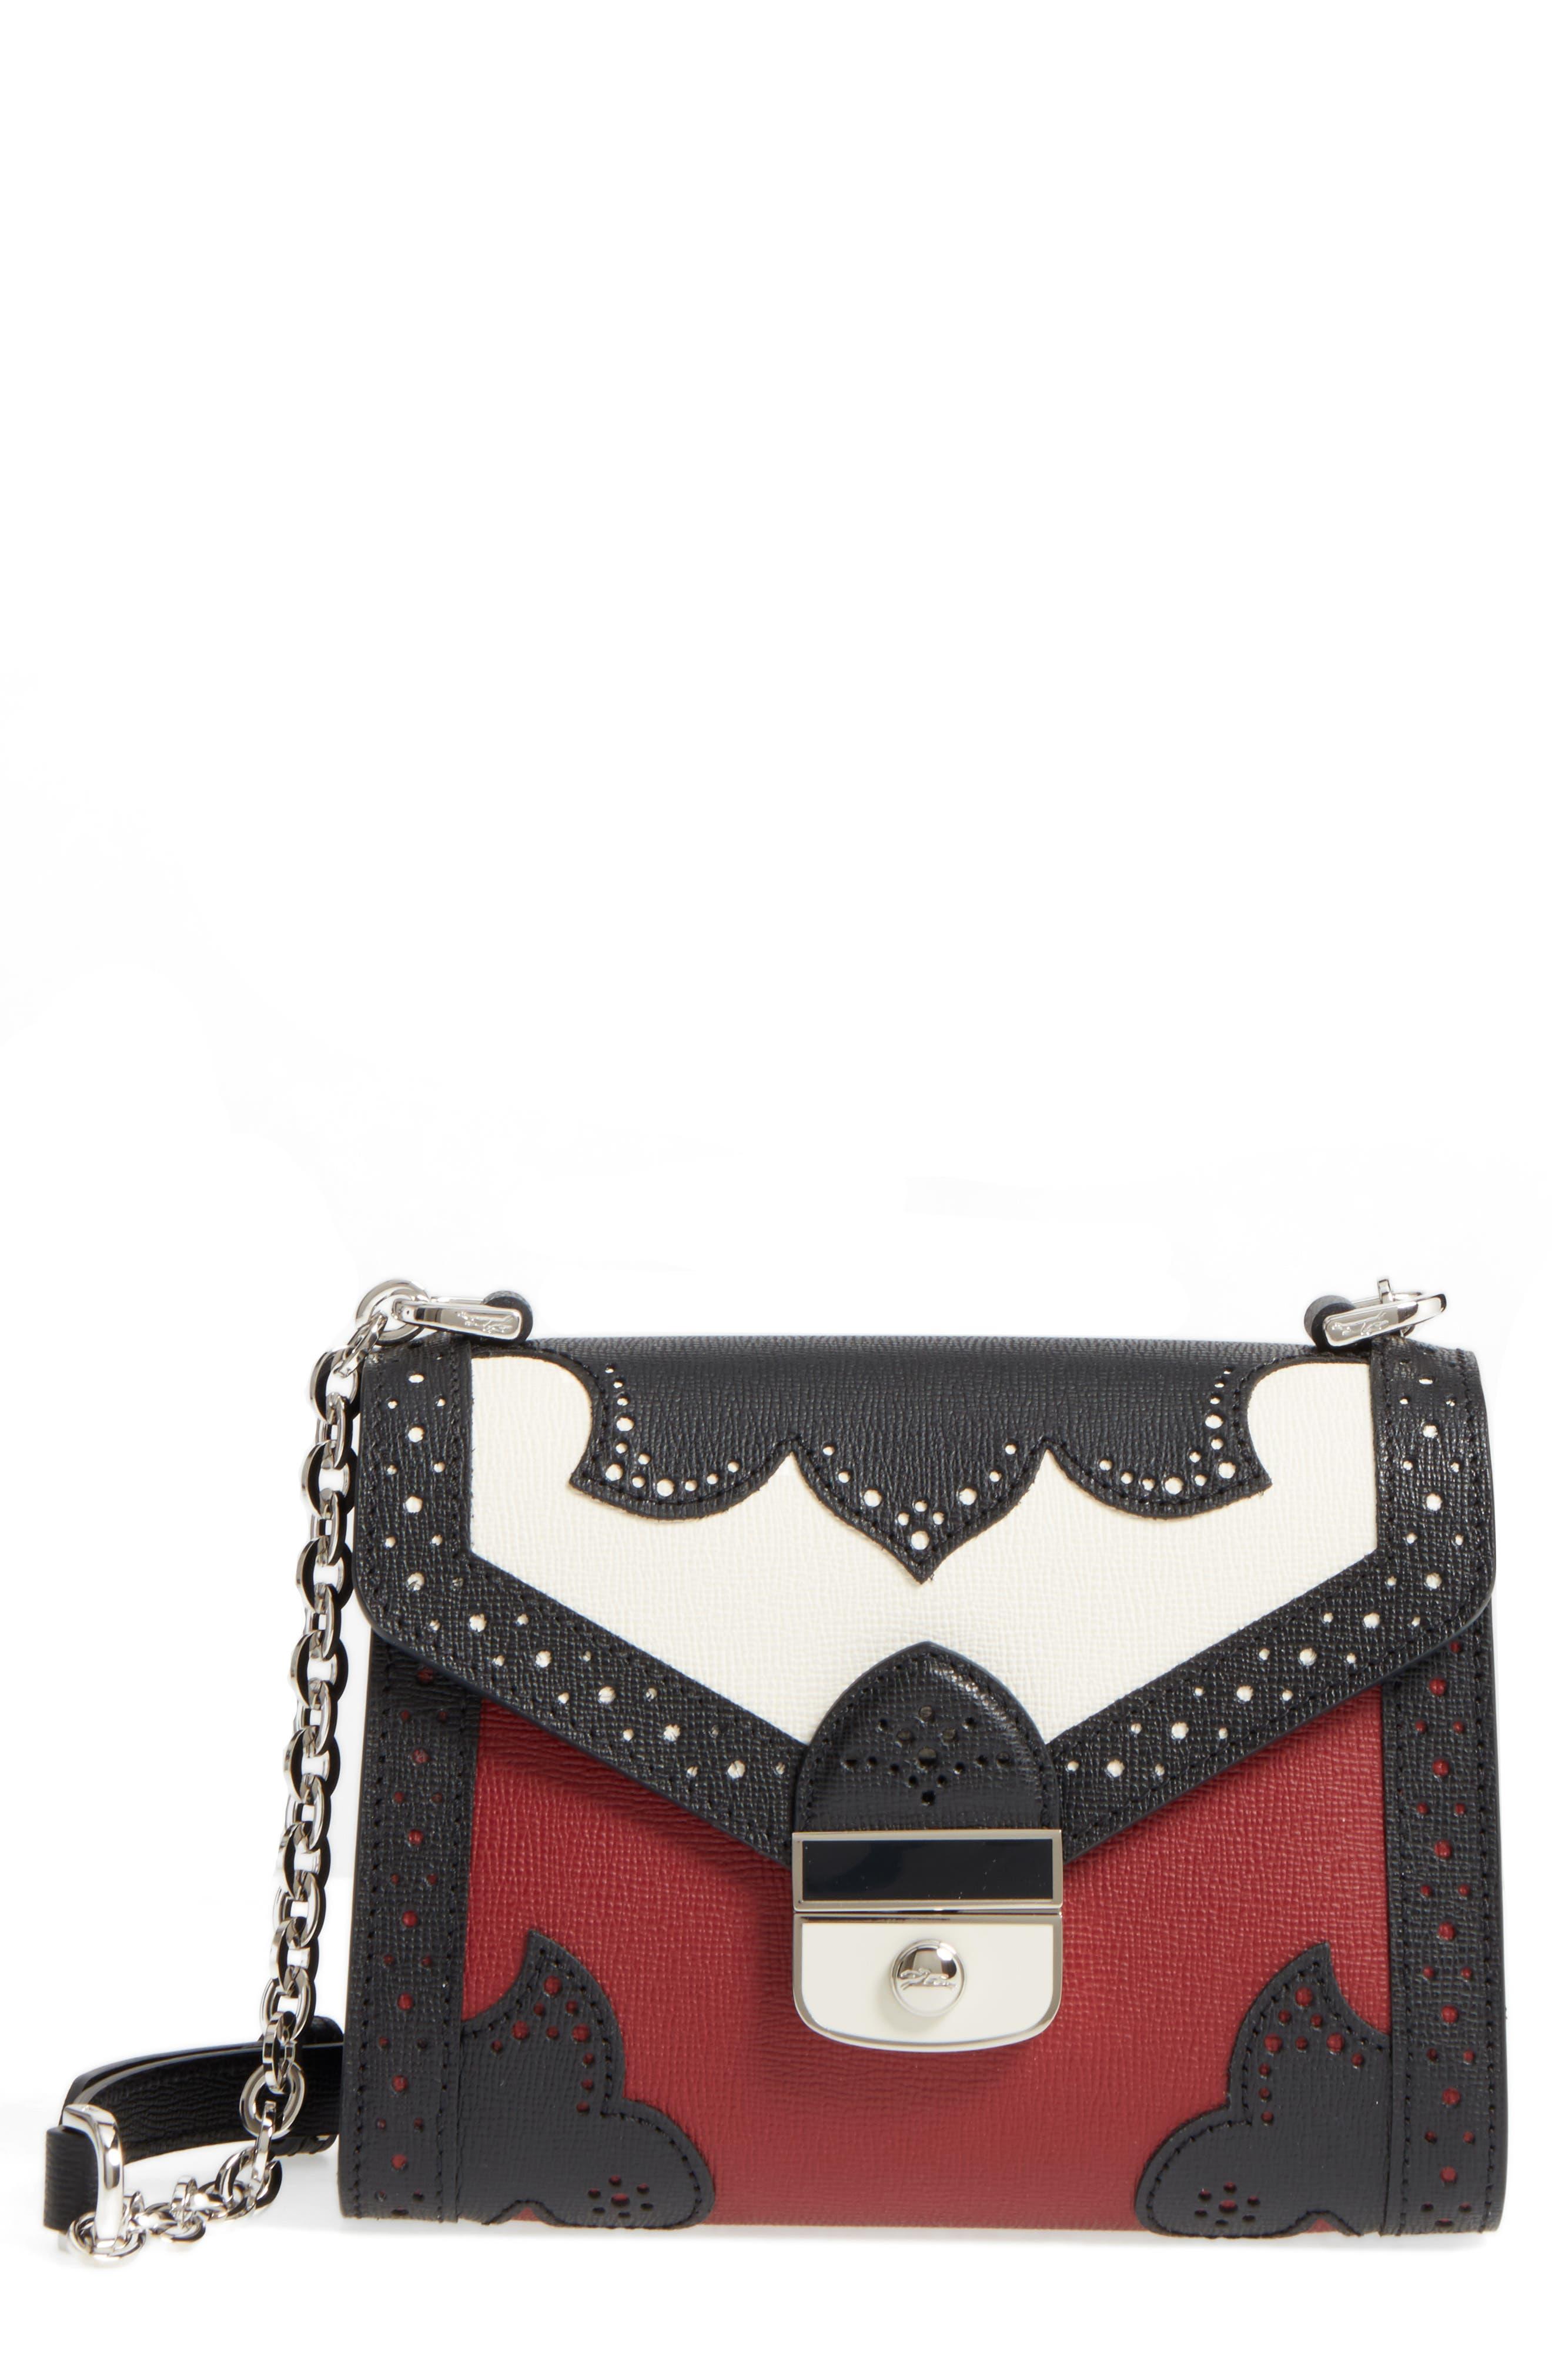 Effrontée Leather Crossbody Bag,                             Main thumbnail 1, color,                             Red Lacquer